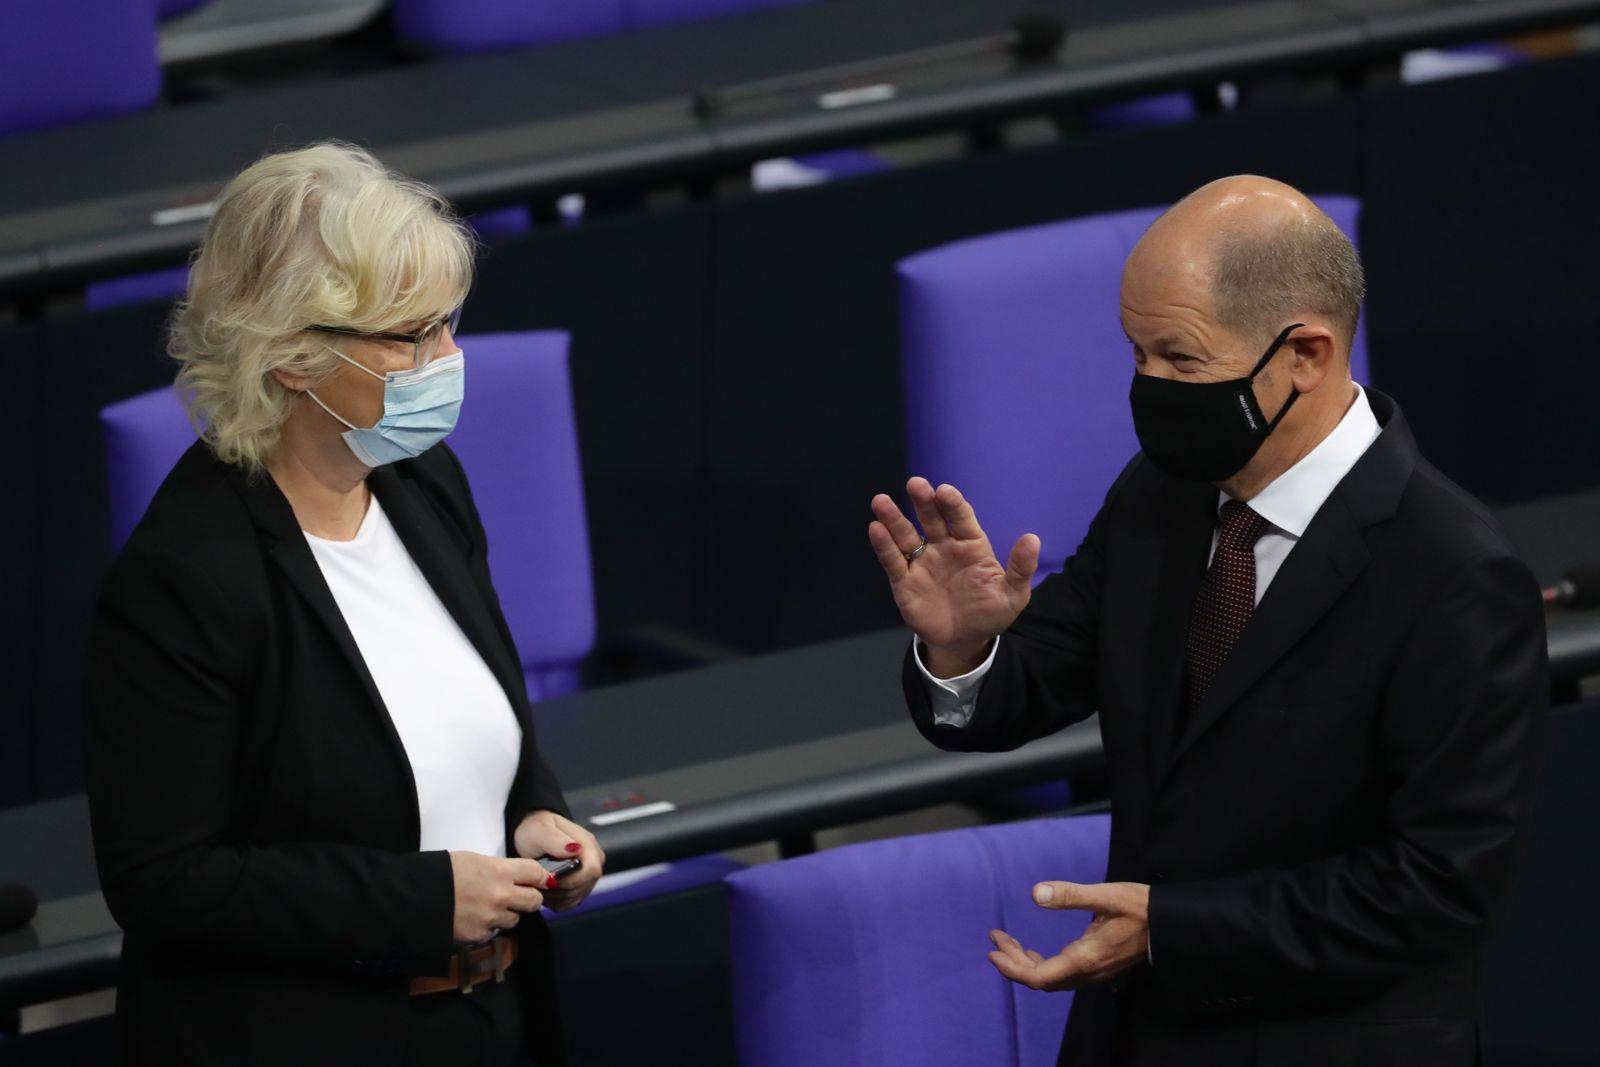 German Bundestag debates on 2021 government budget, Berlin, Germany - 29 Sep 2020